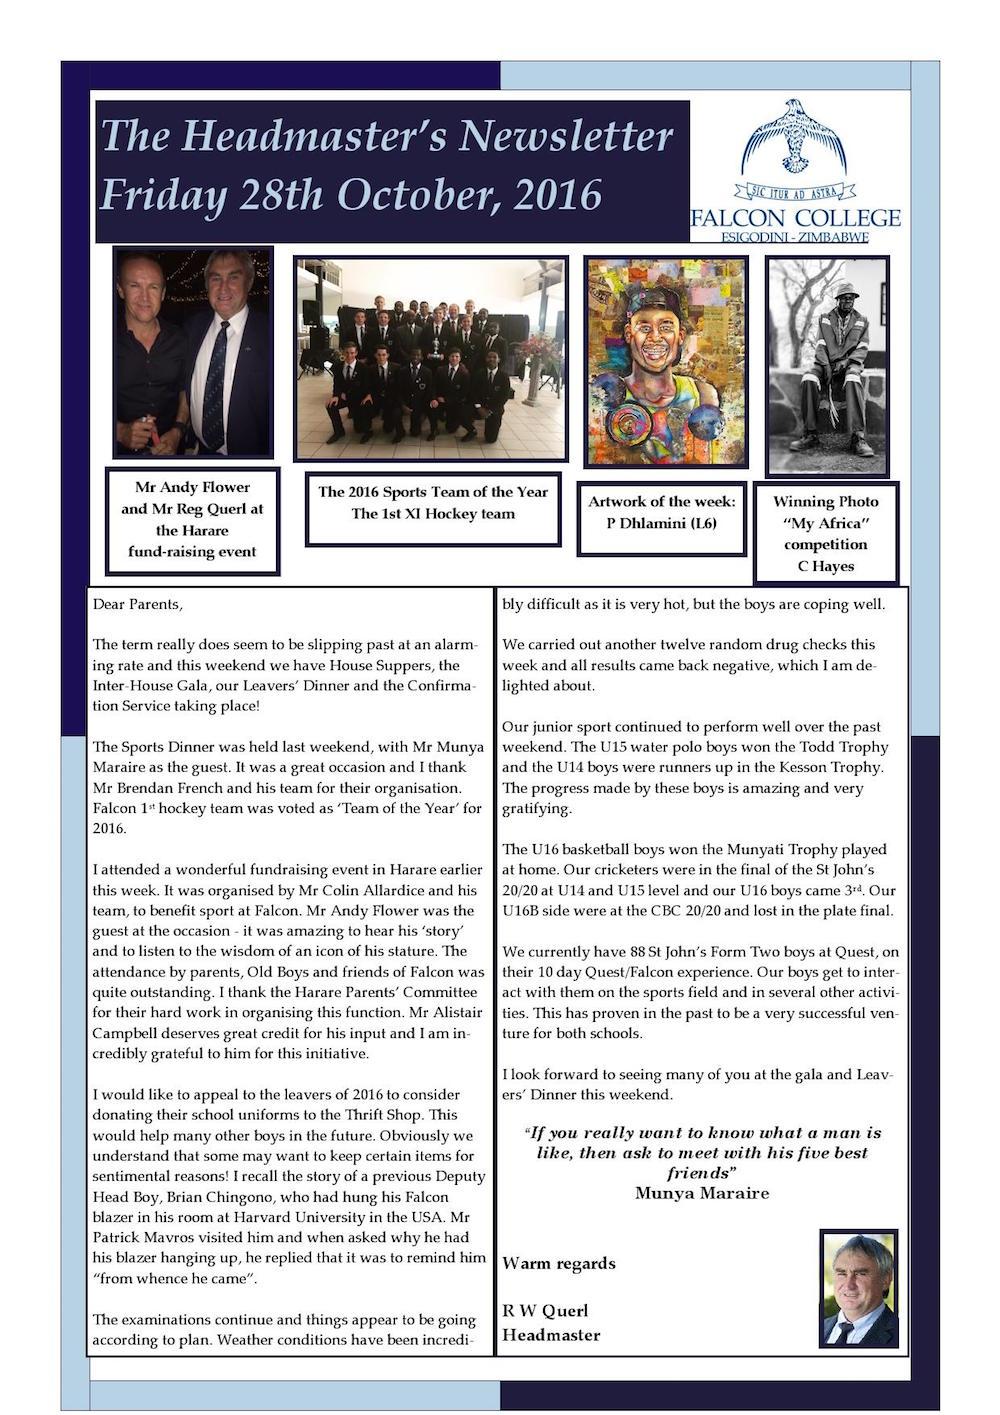 headmasters-newsletter-friday-28th-october-2016-edited_000001